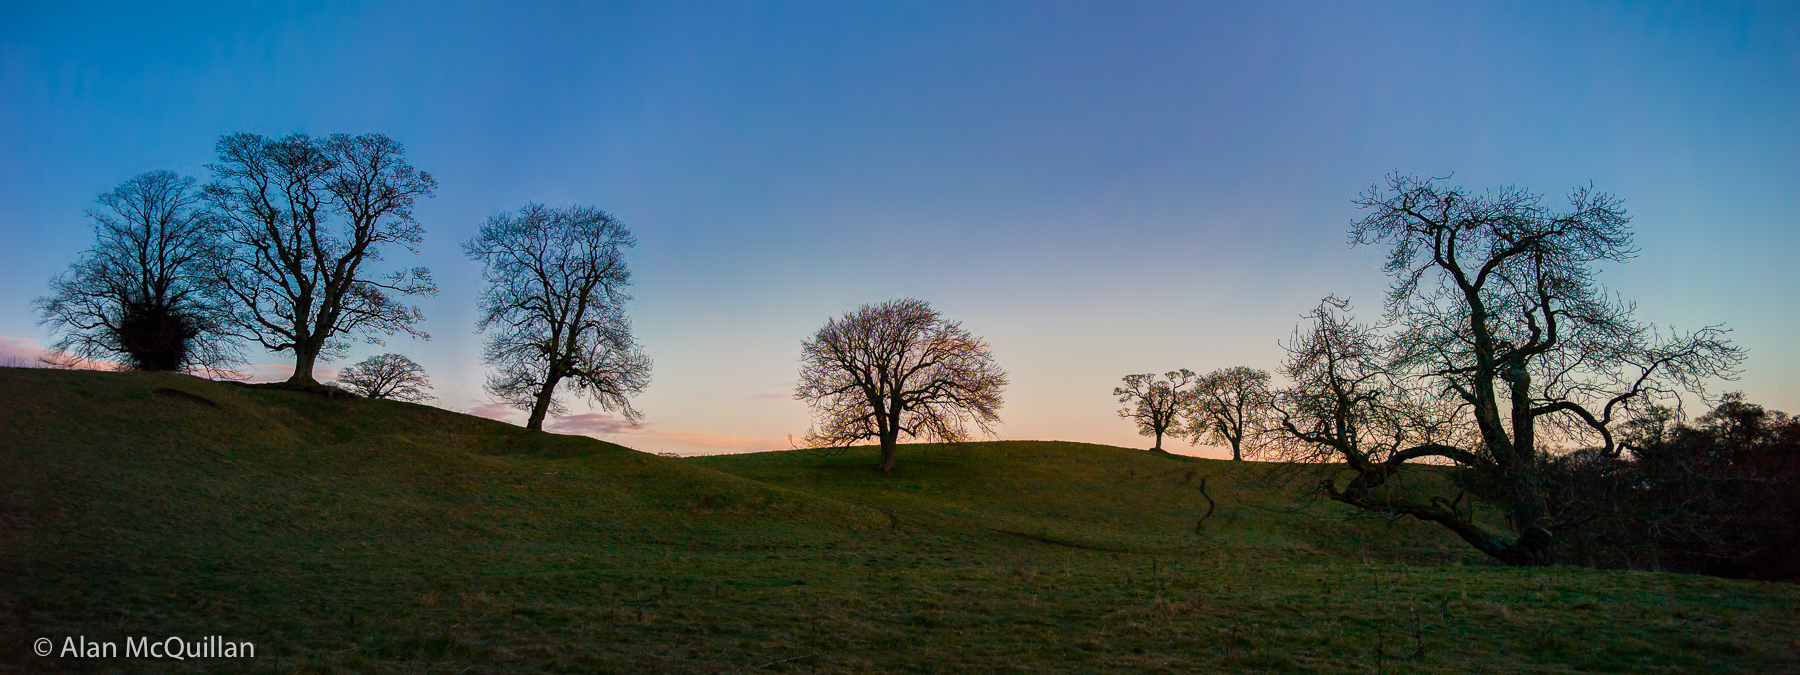 Daybreak, Woodcote Park, Midlothian